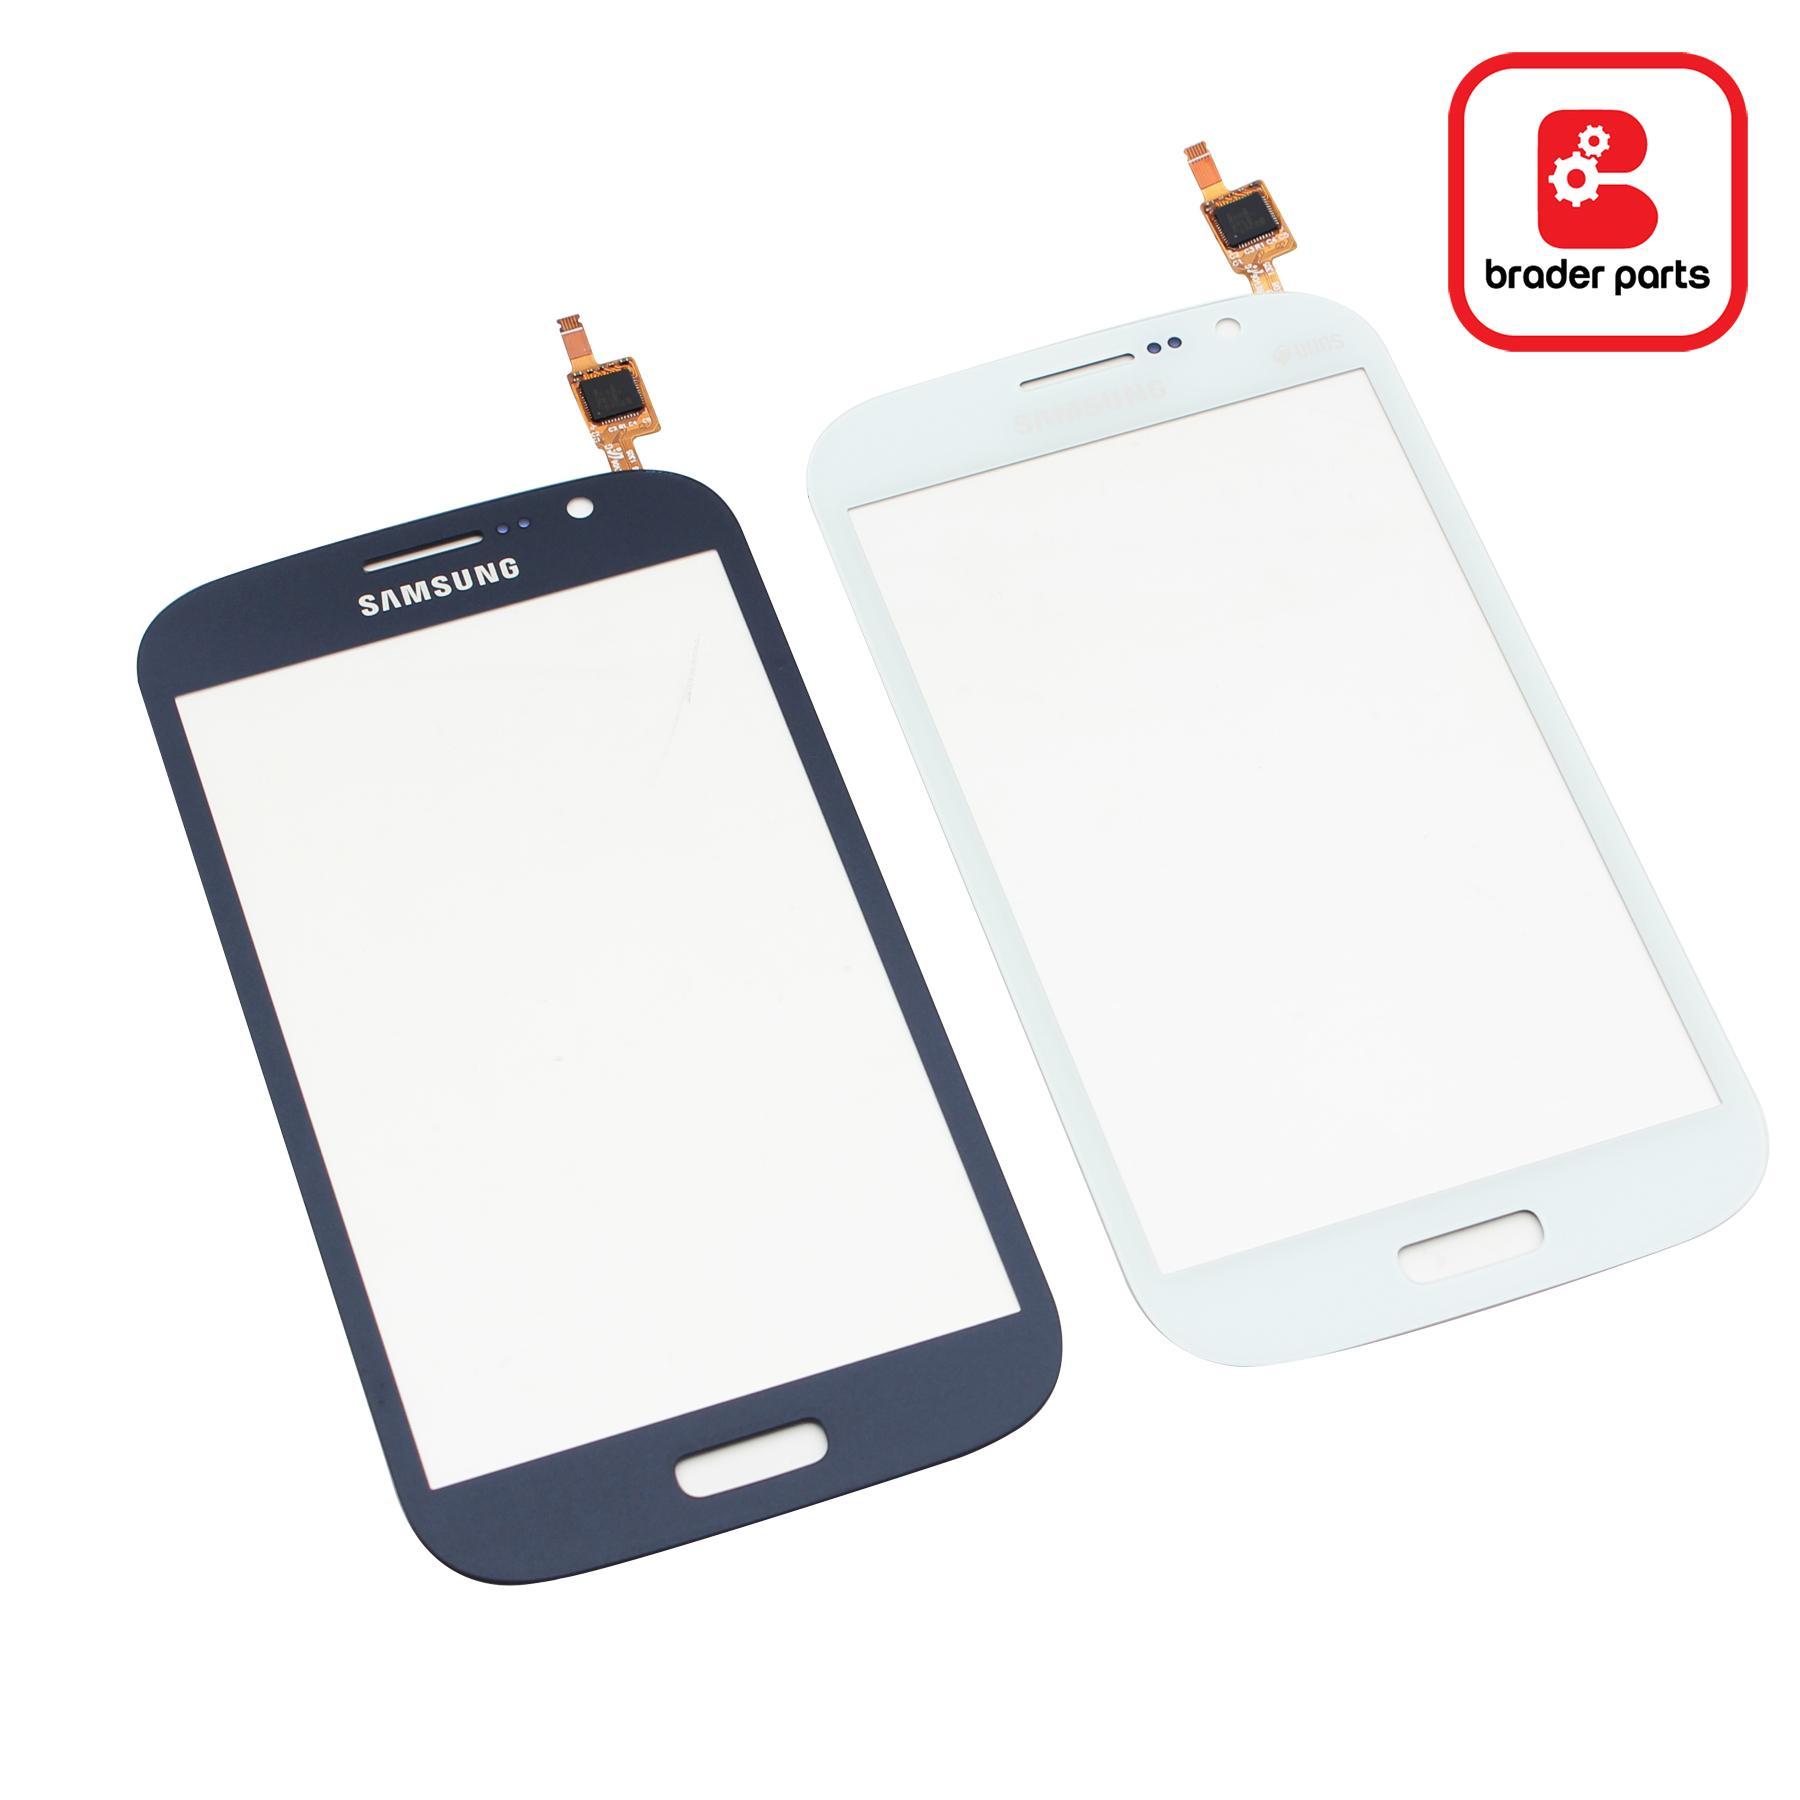 Suku Cadang Handphone Samsung Ts Monitor Touchscreen Led Putih Grand Duos I9082 I9080